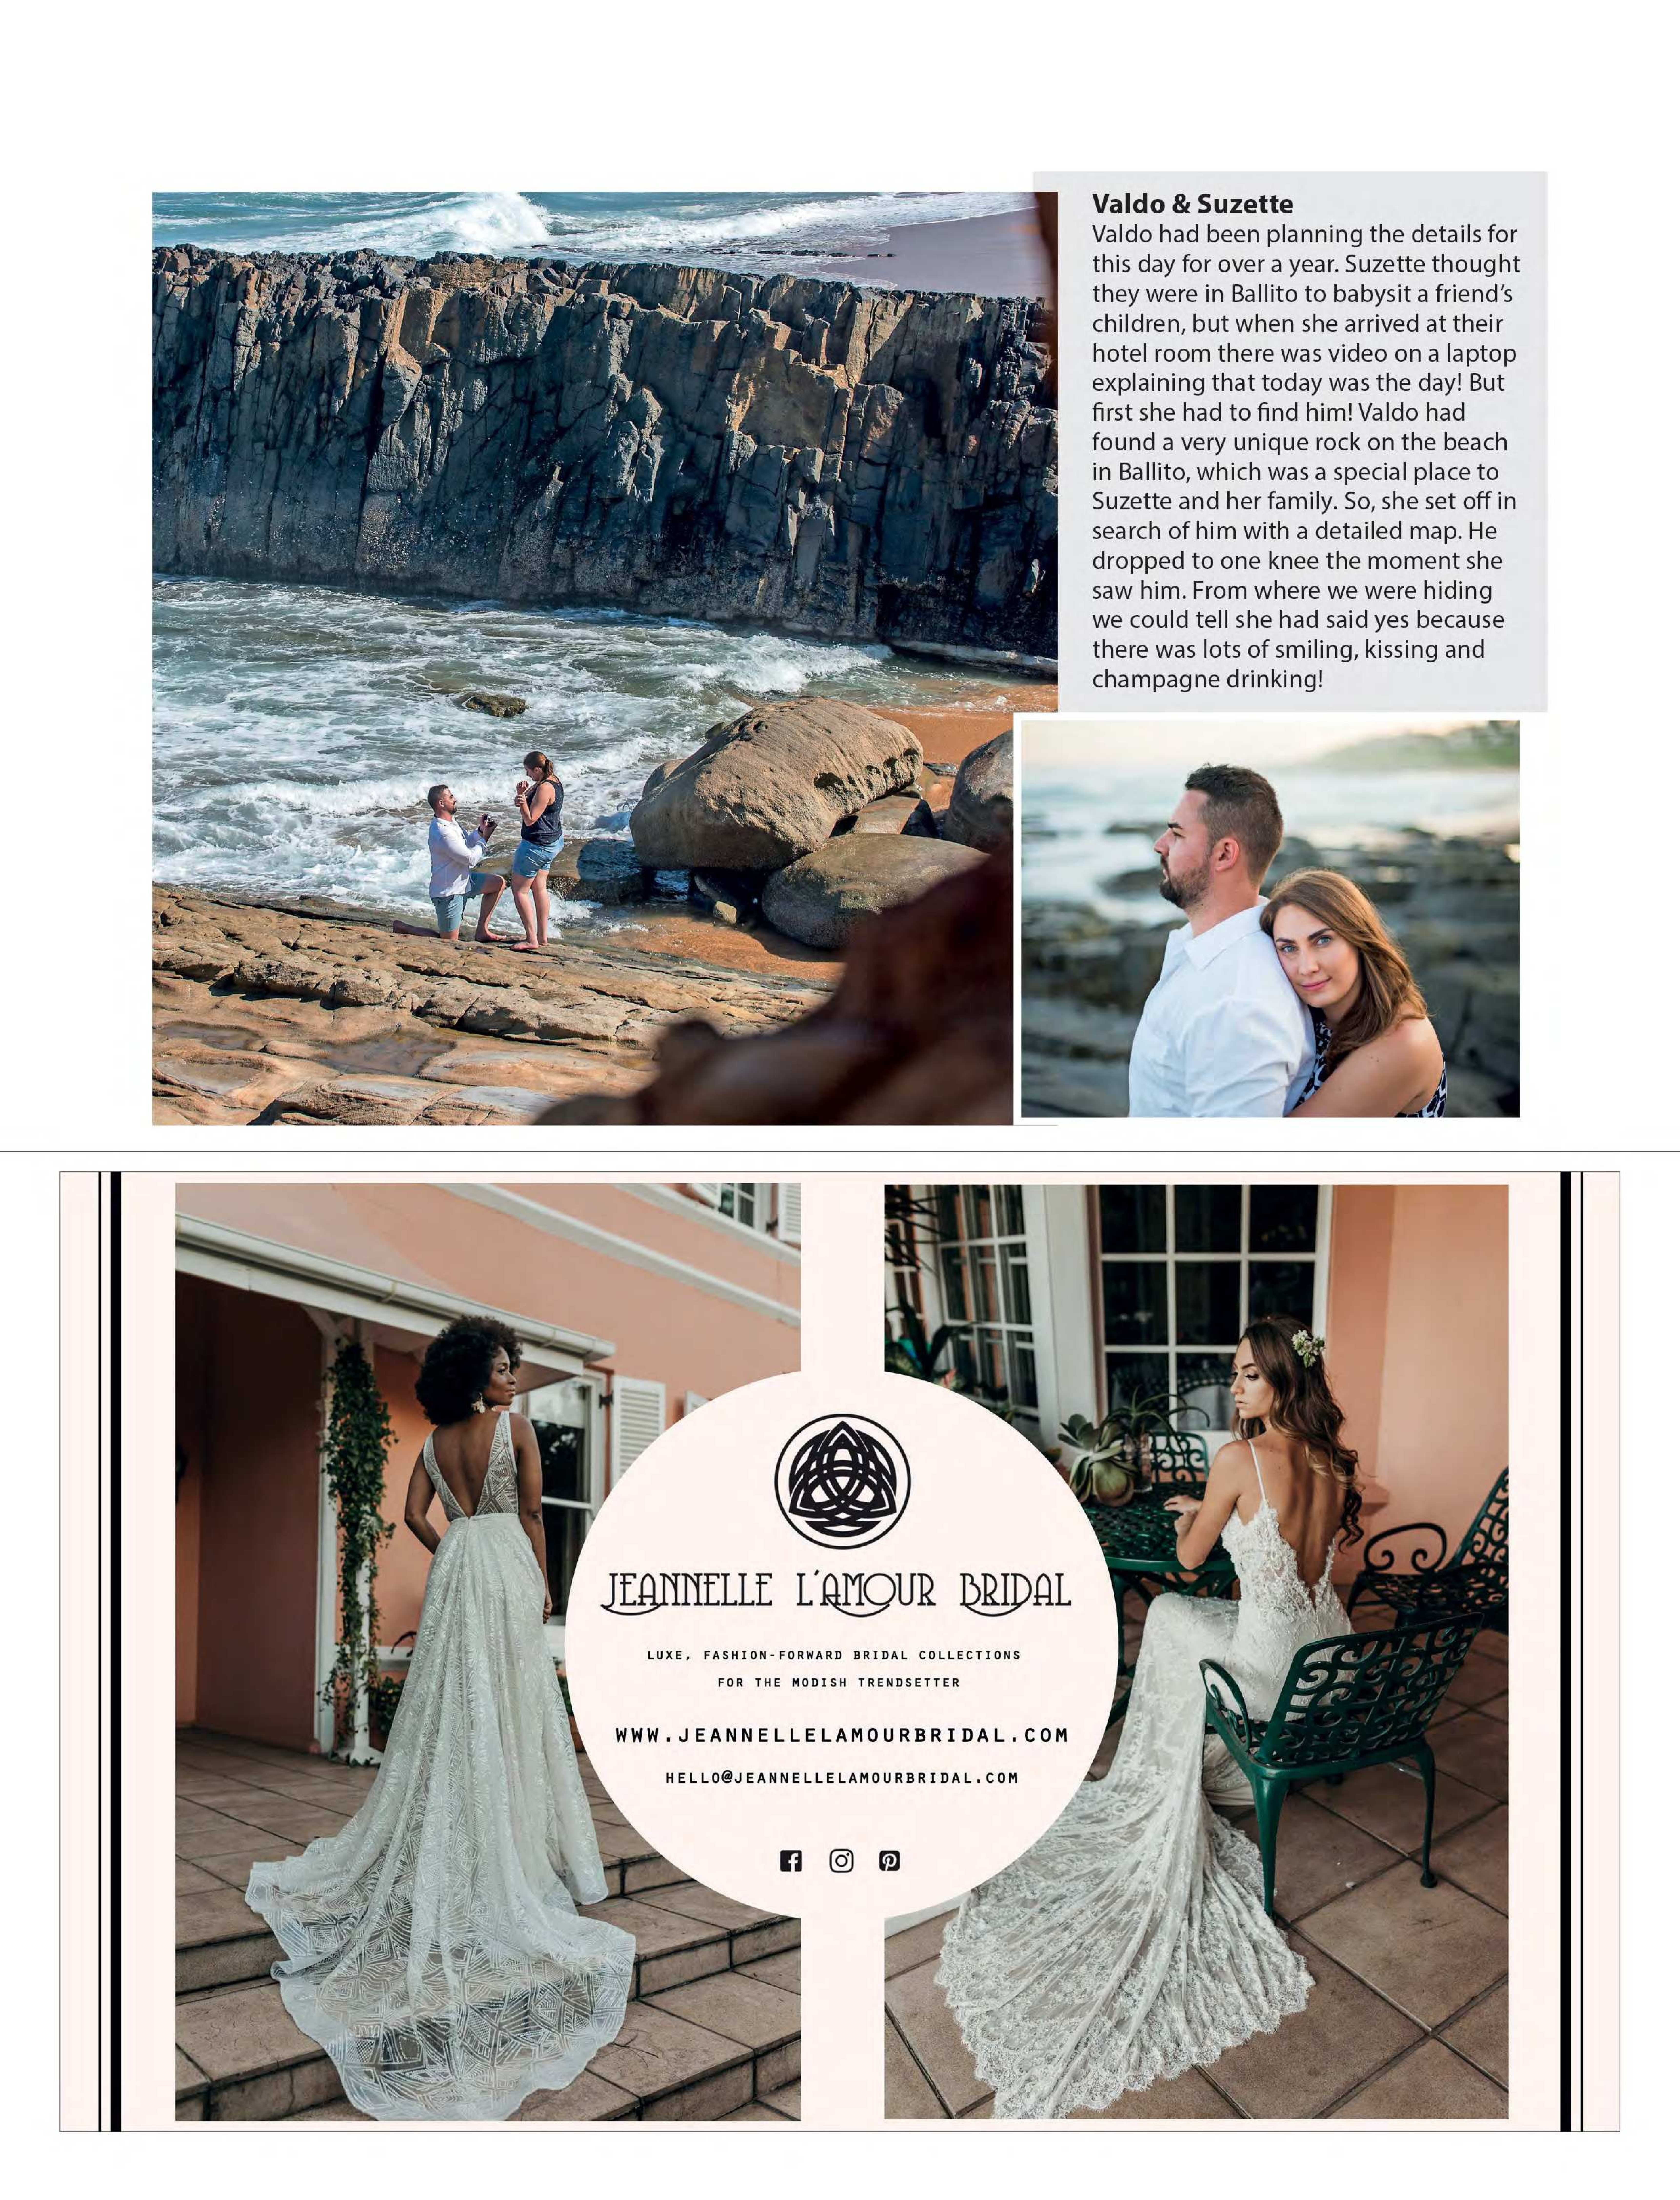 get-magazine-ballitoumhlanga-may-2018-epapers-page-35